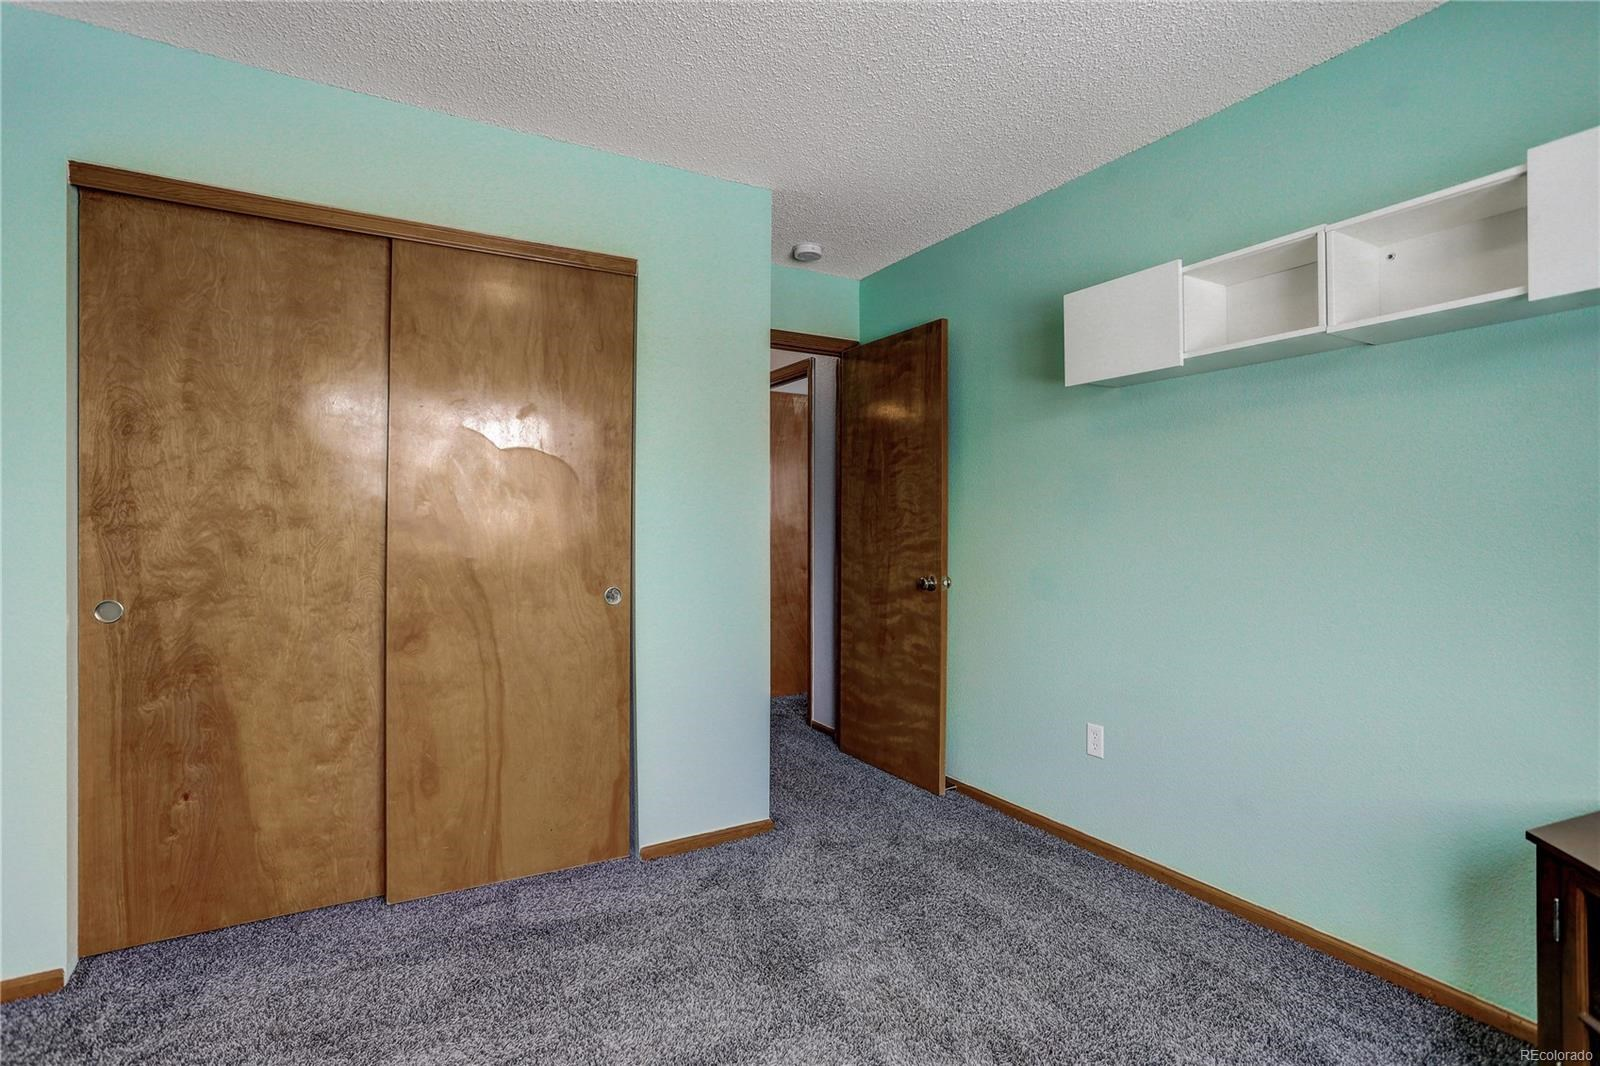 MLS# 9576808 - 28 - 2130 Gold Dust Lane, Highlands Ranch, CO 80129